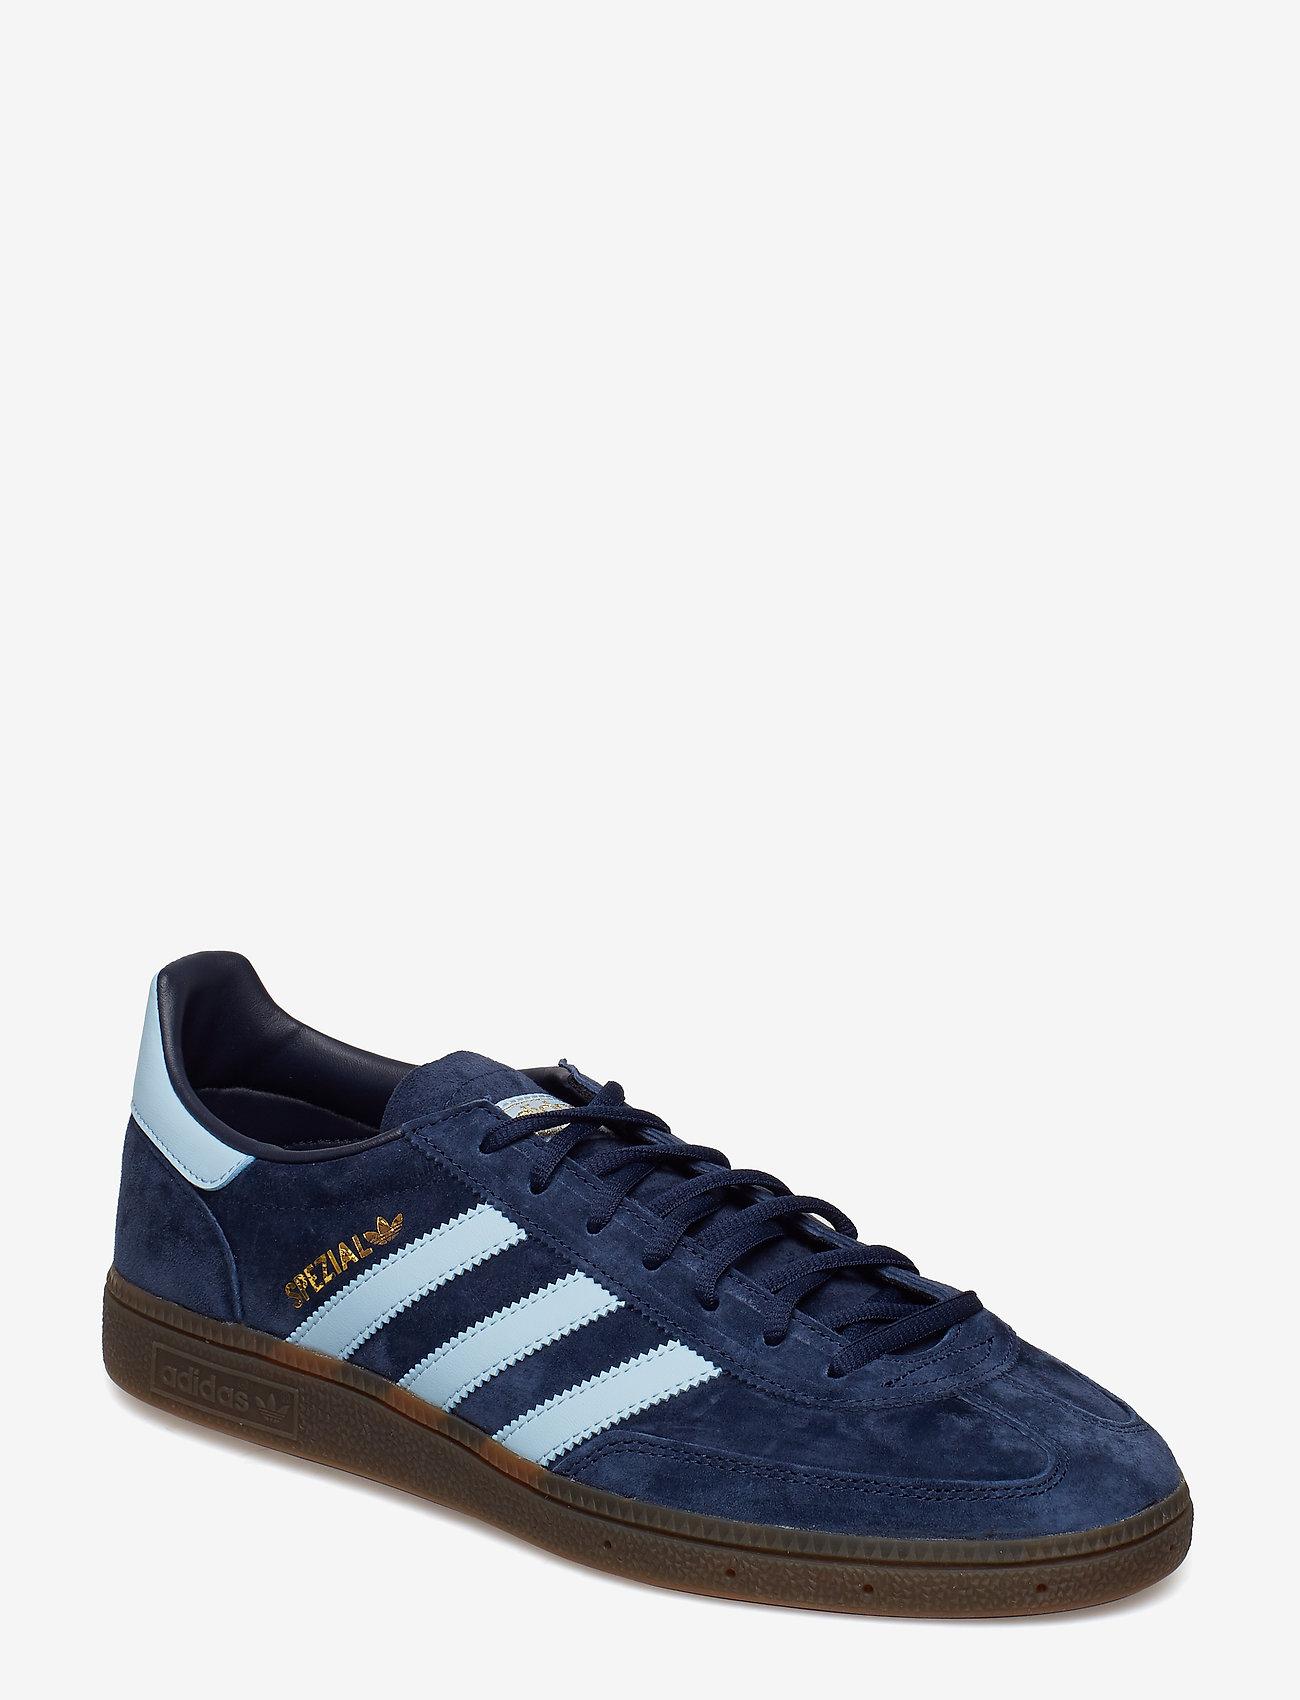 adidas Originals - Handball Spezial - lav ankel - conavy/clesky/gum5 - 0